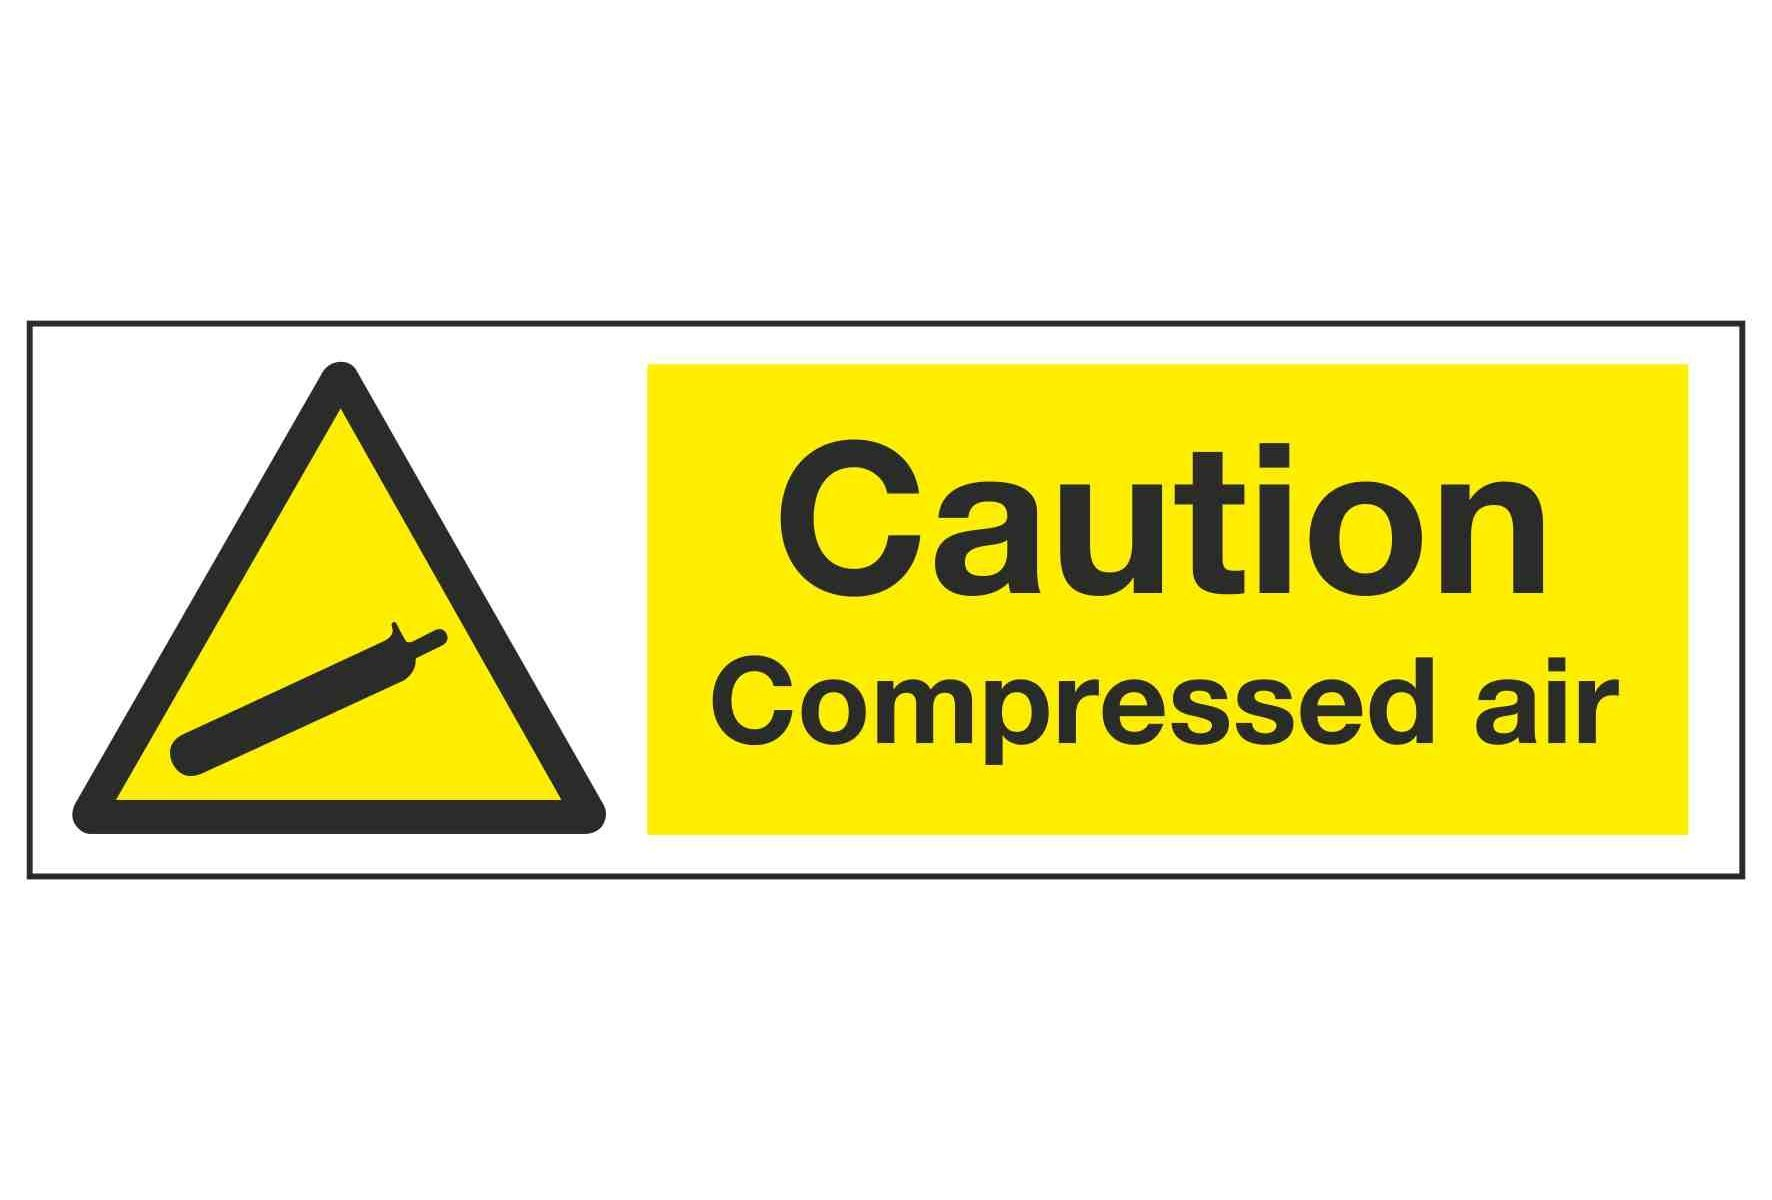 Caution Compressed air